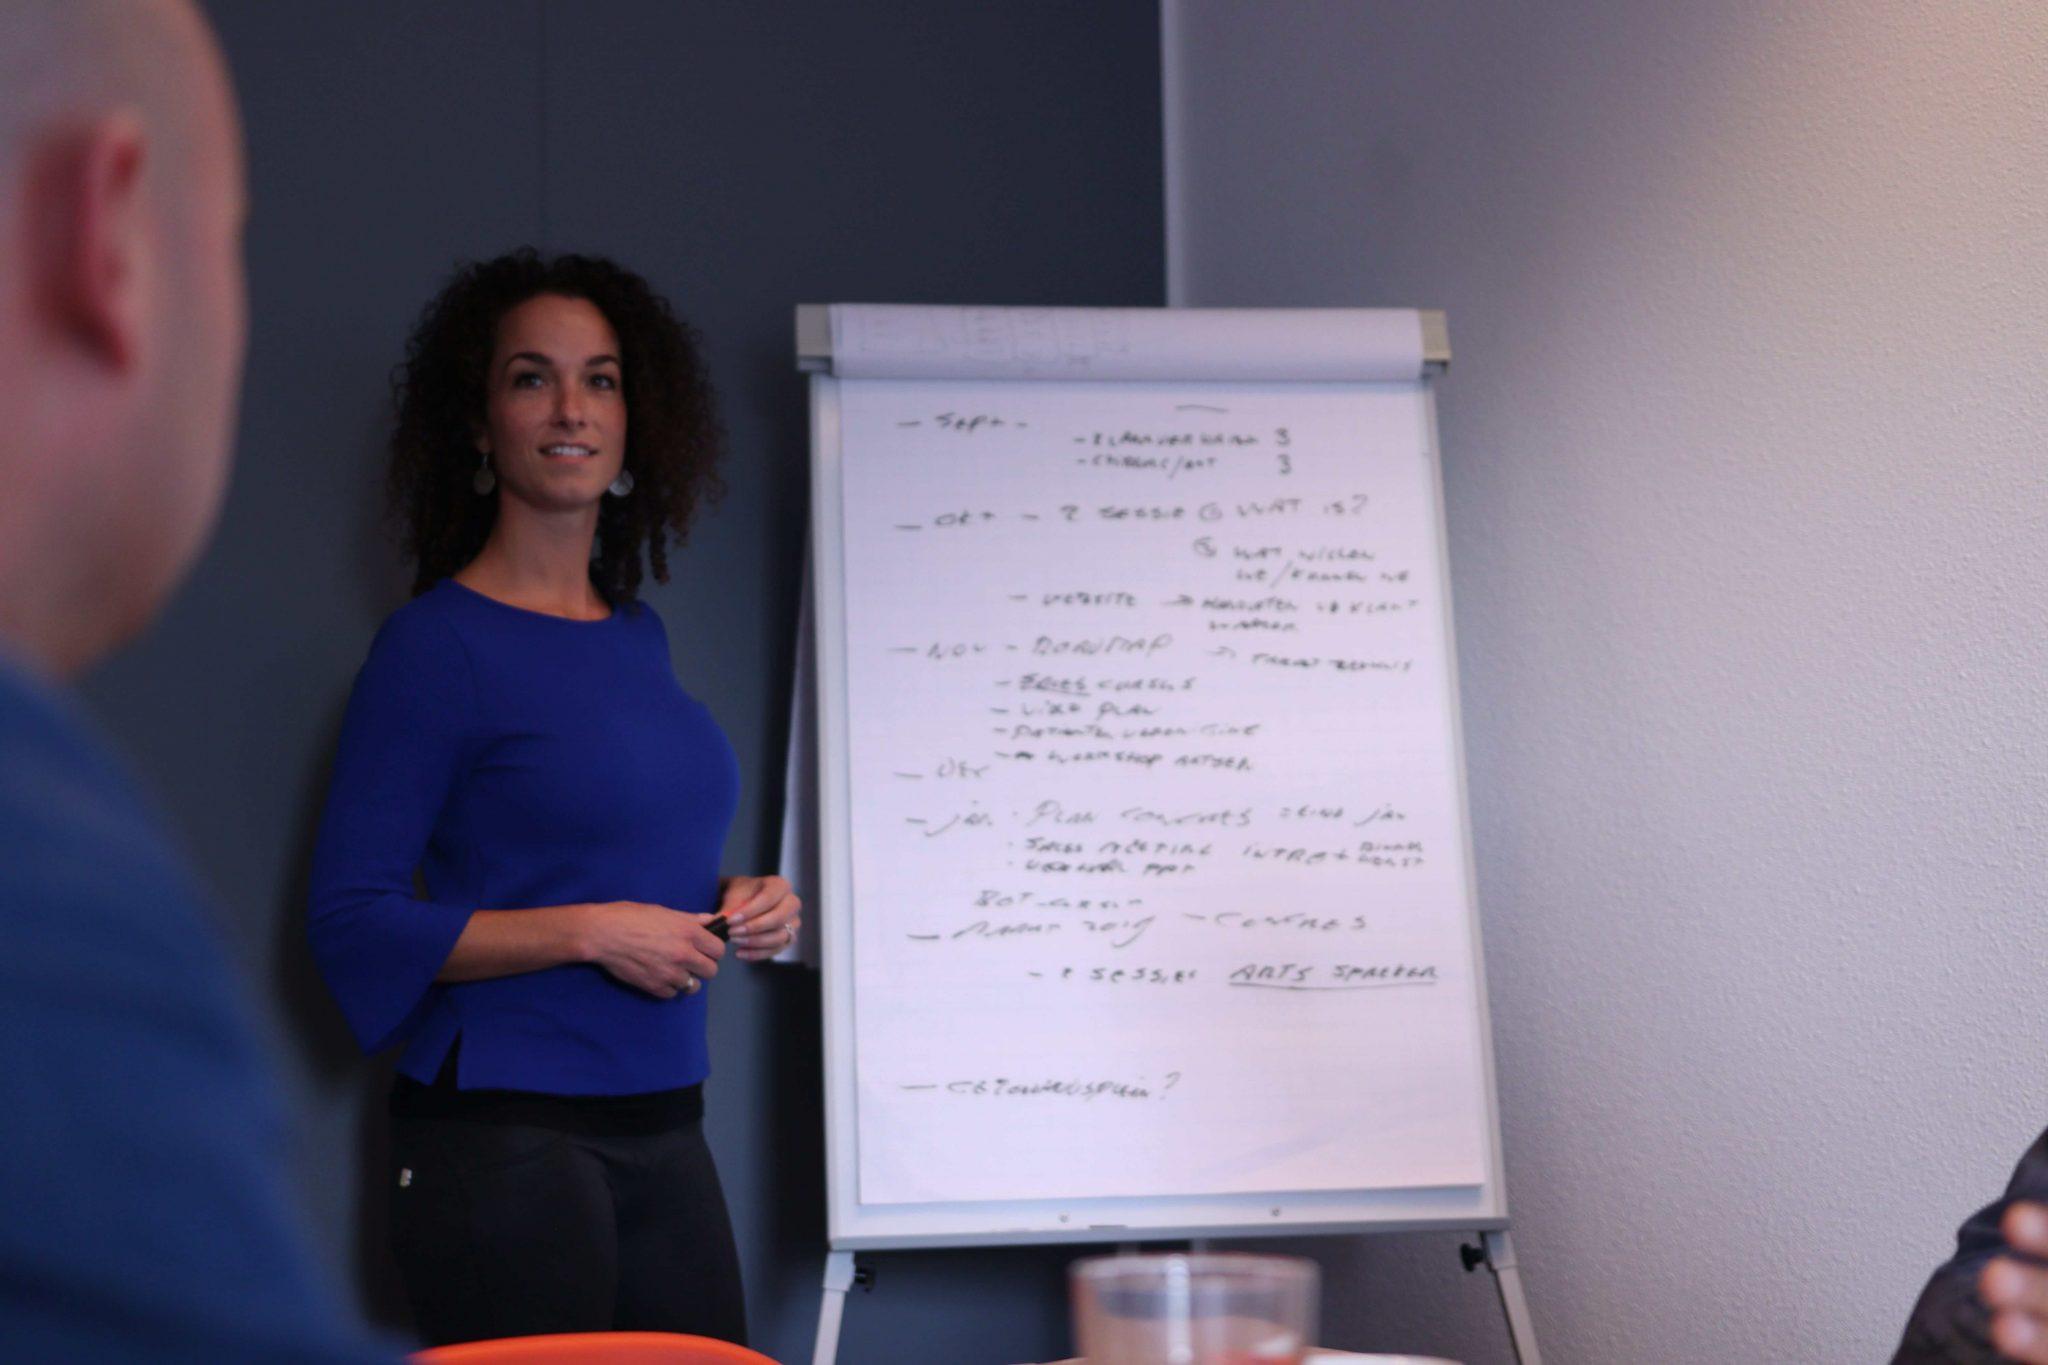 boodschap planning online marketing event